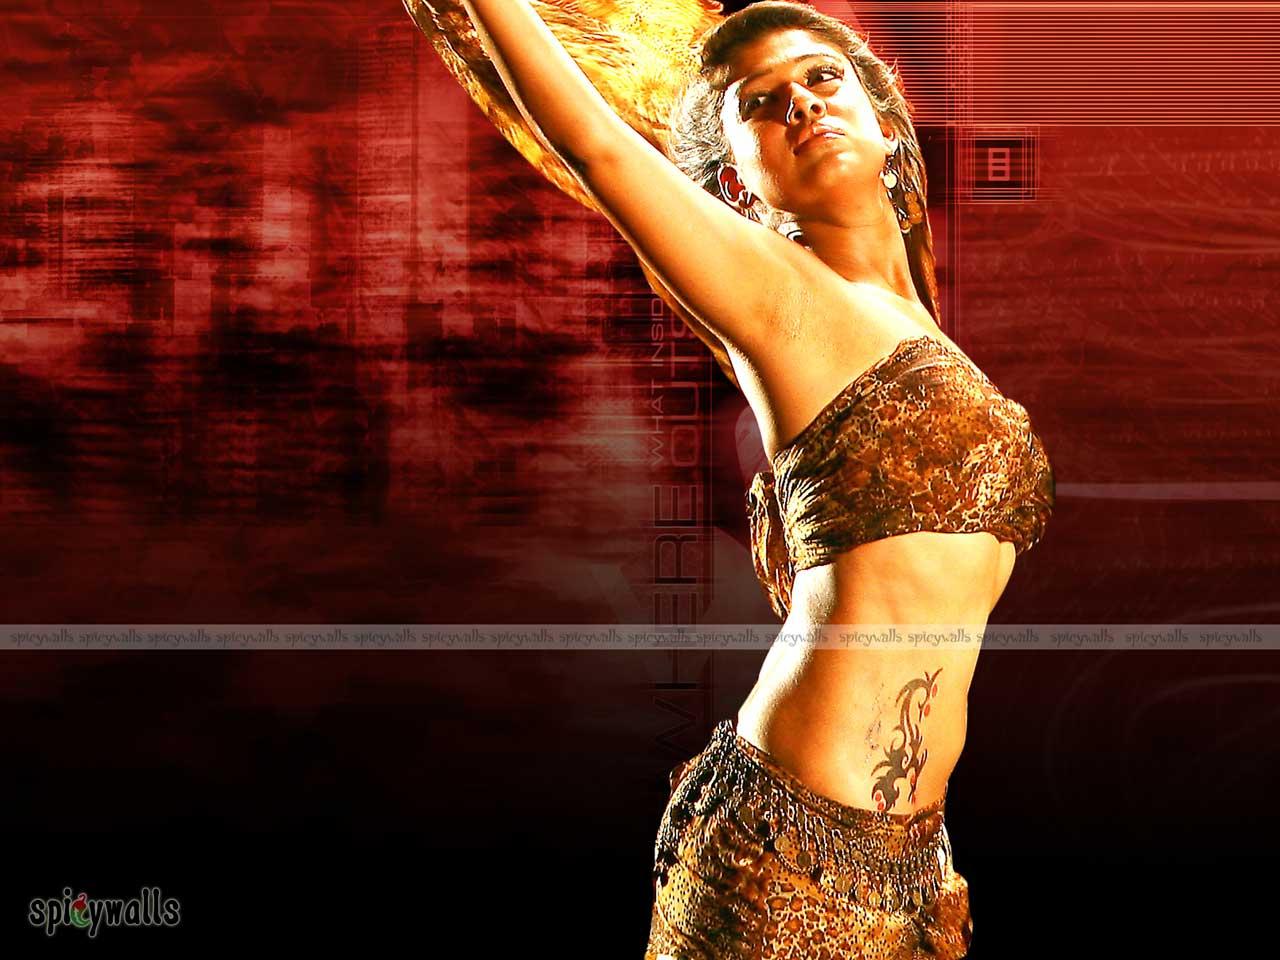 http://3.bp.blogspot.com/-1NPGi9M2N-Y/TygFh48bVYI/AAAAAAAAB7k/oNzZIBkF67s/s1600/nayanthara-hot-belly-tattoo.jpg